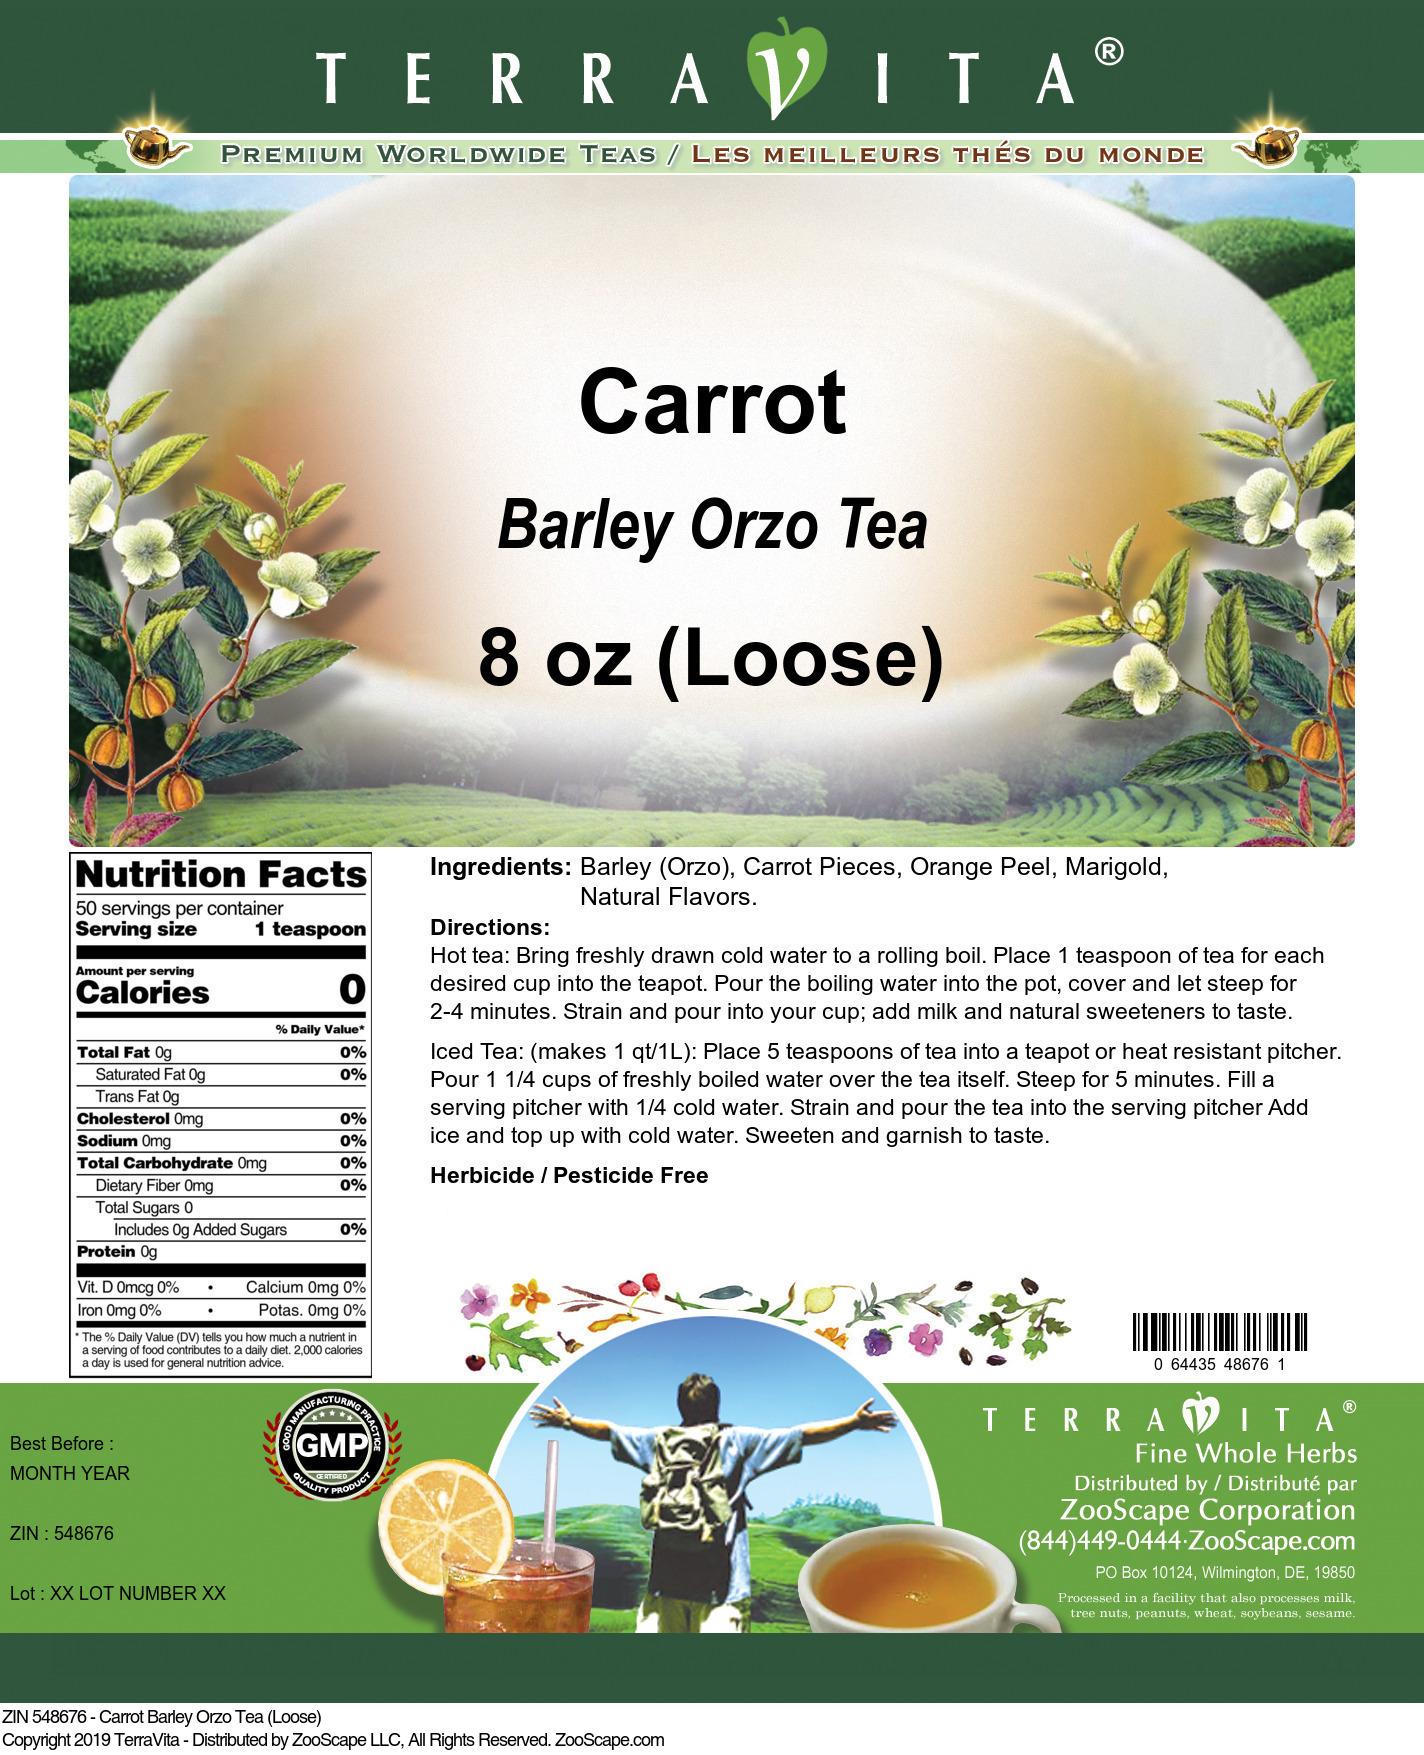 Carrot Barley Orzo